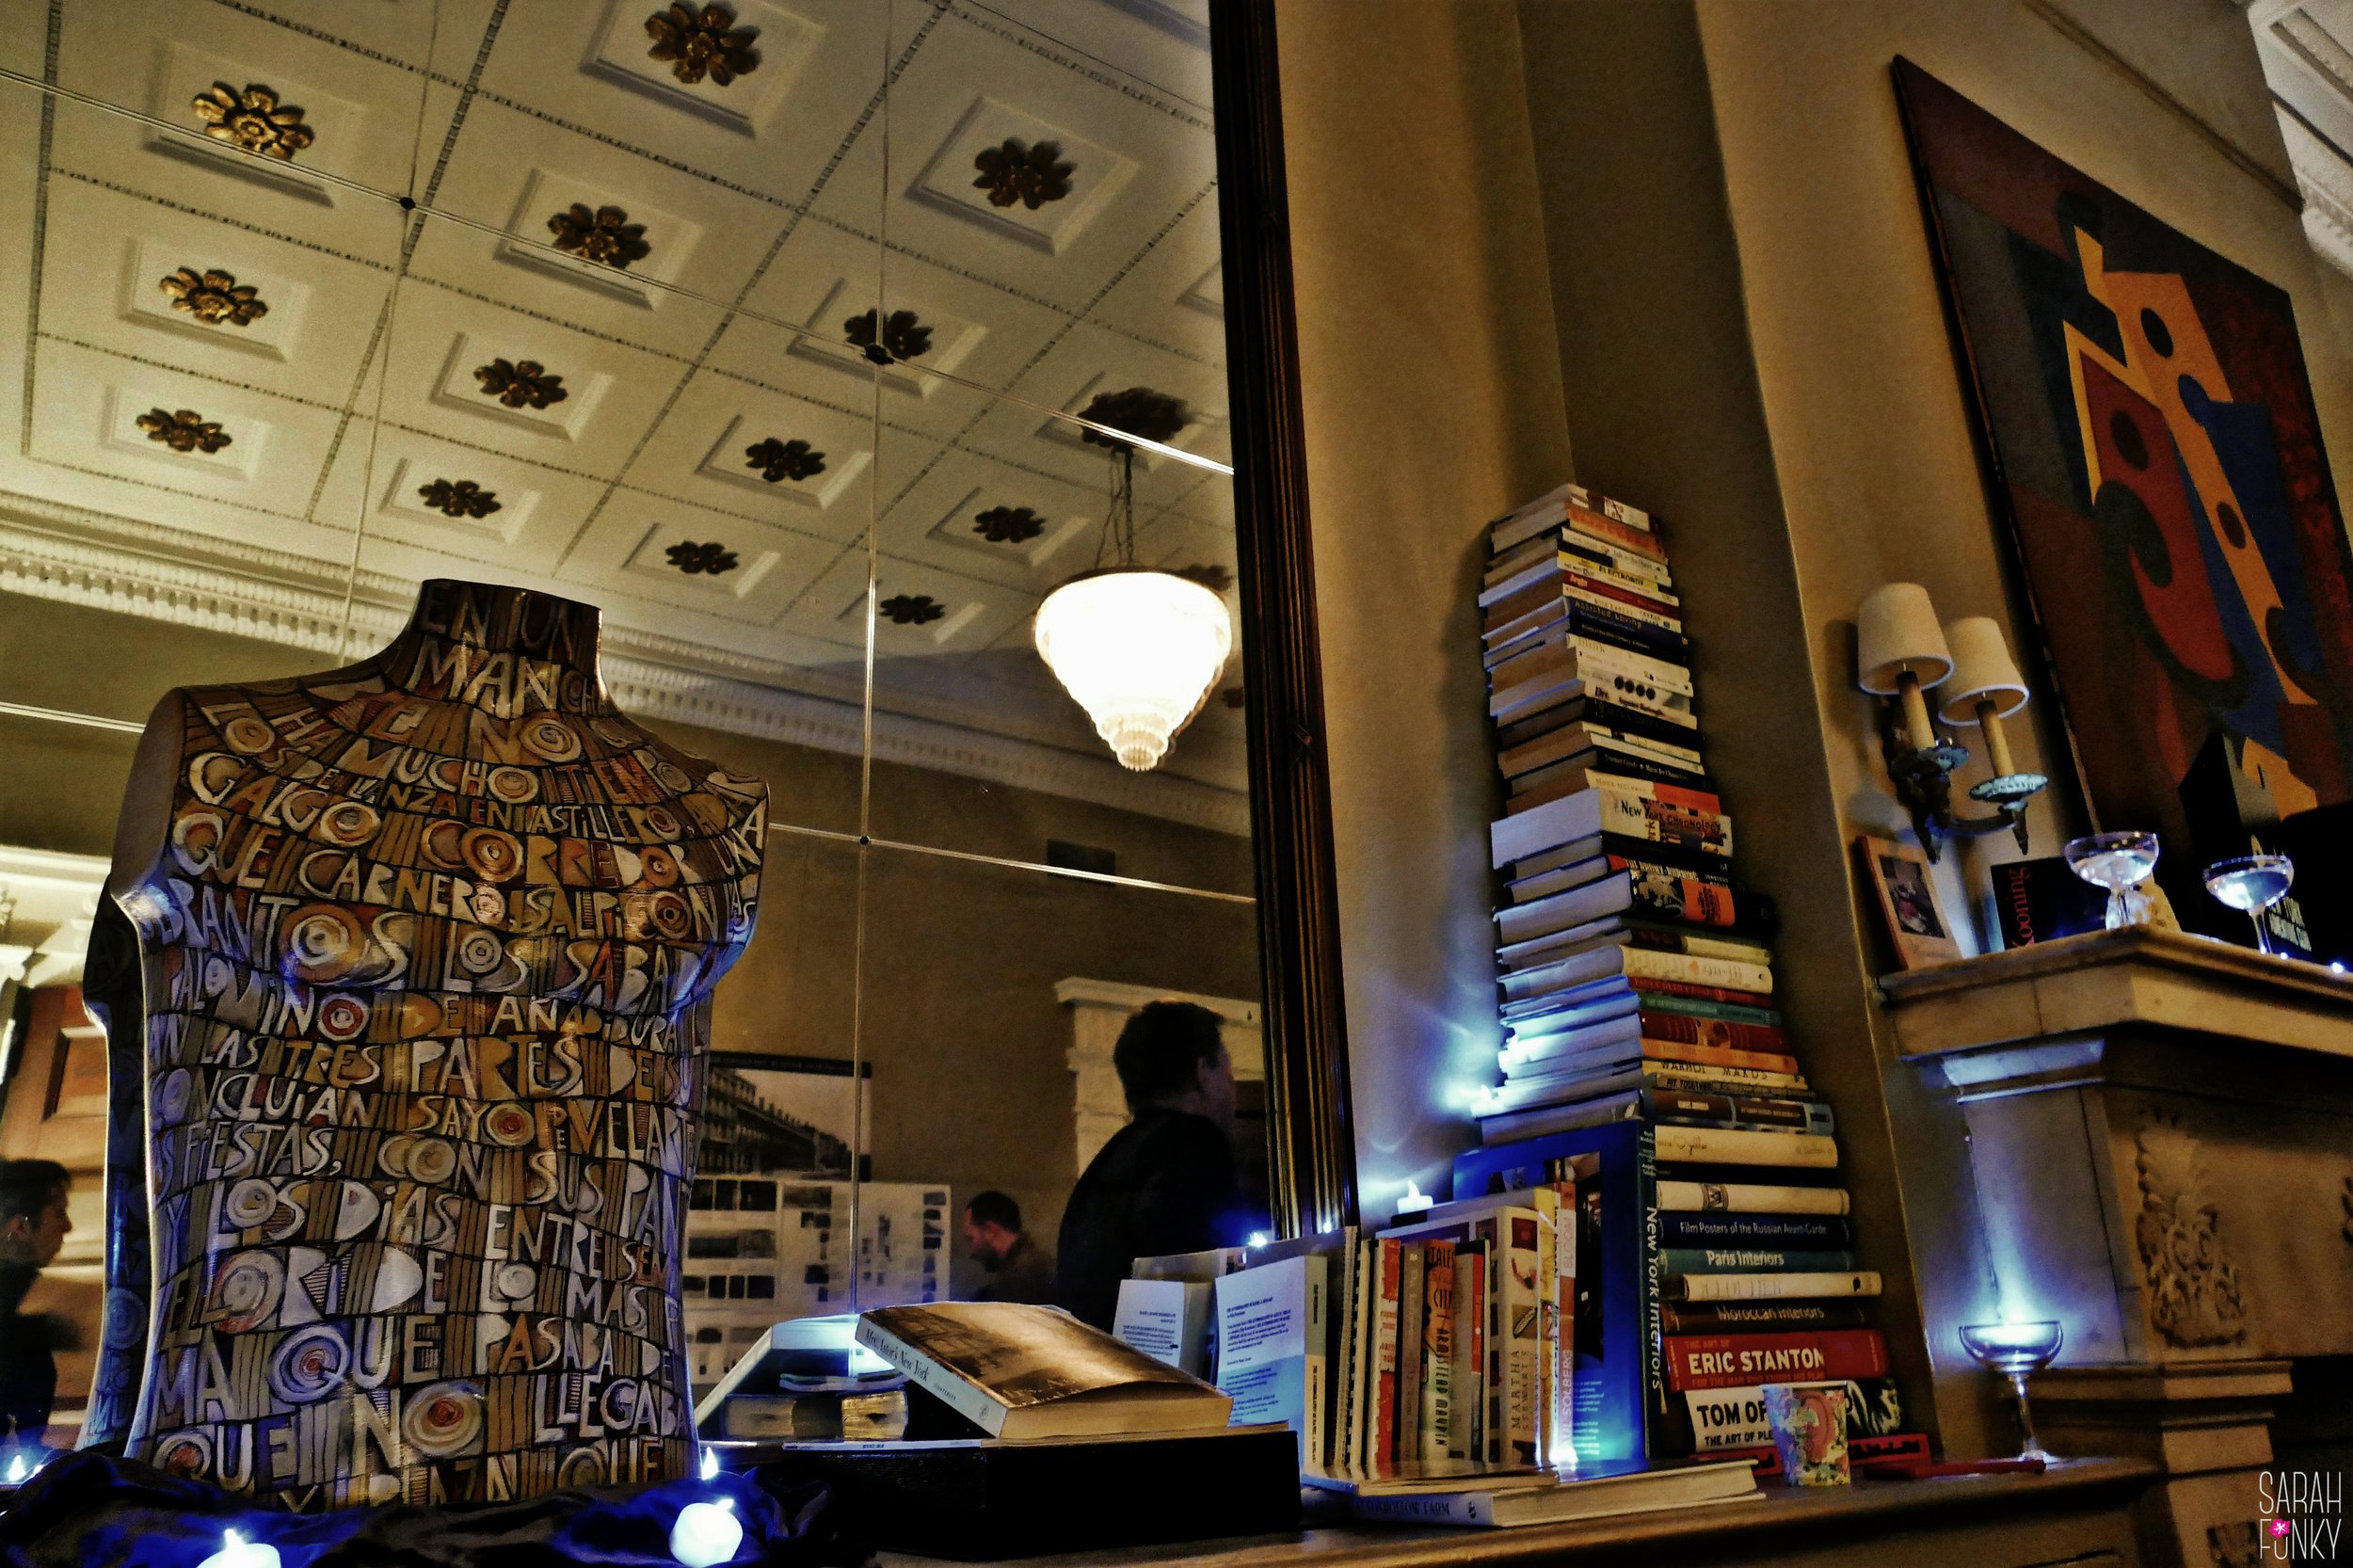 Inside the pop-up Gilded Age speakeasy near Astor Place.